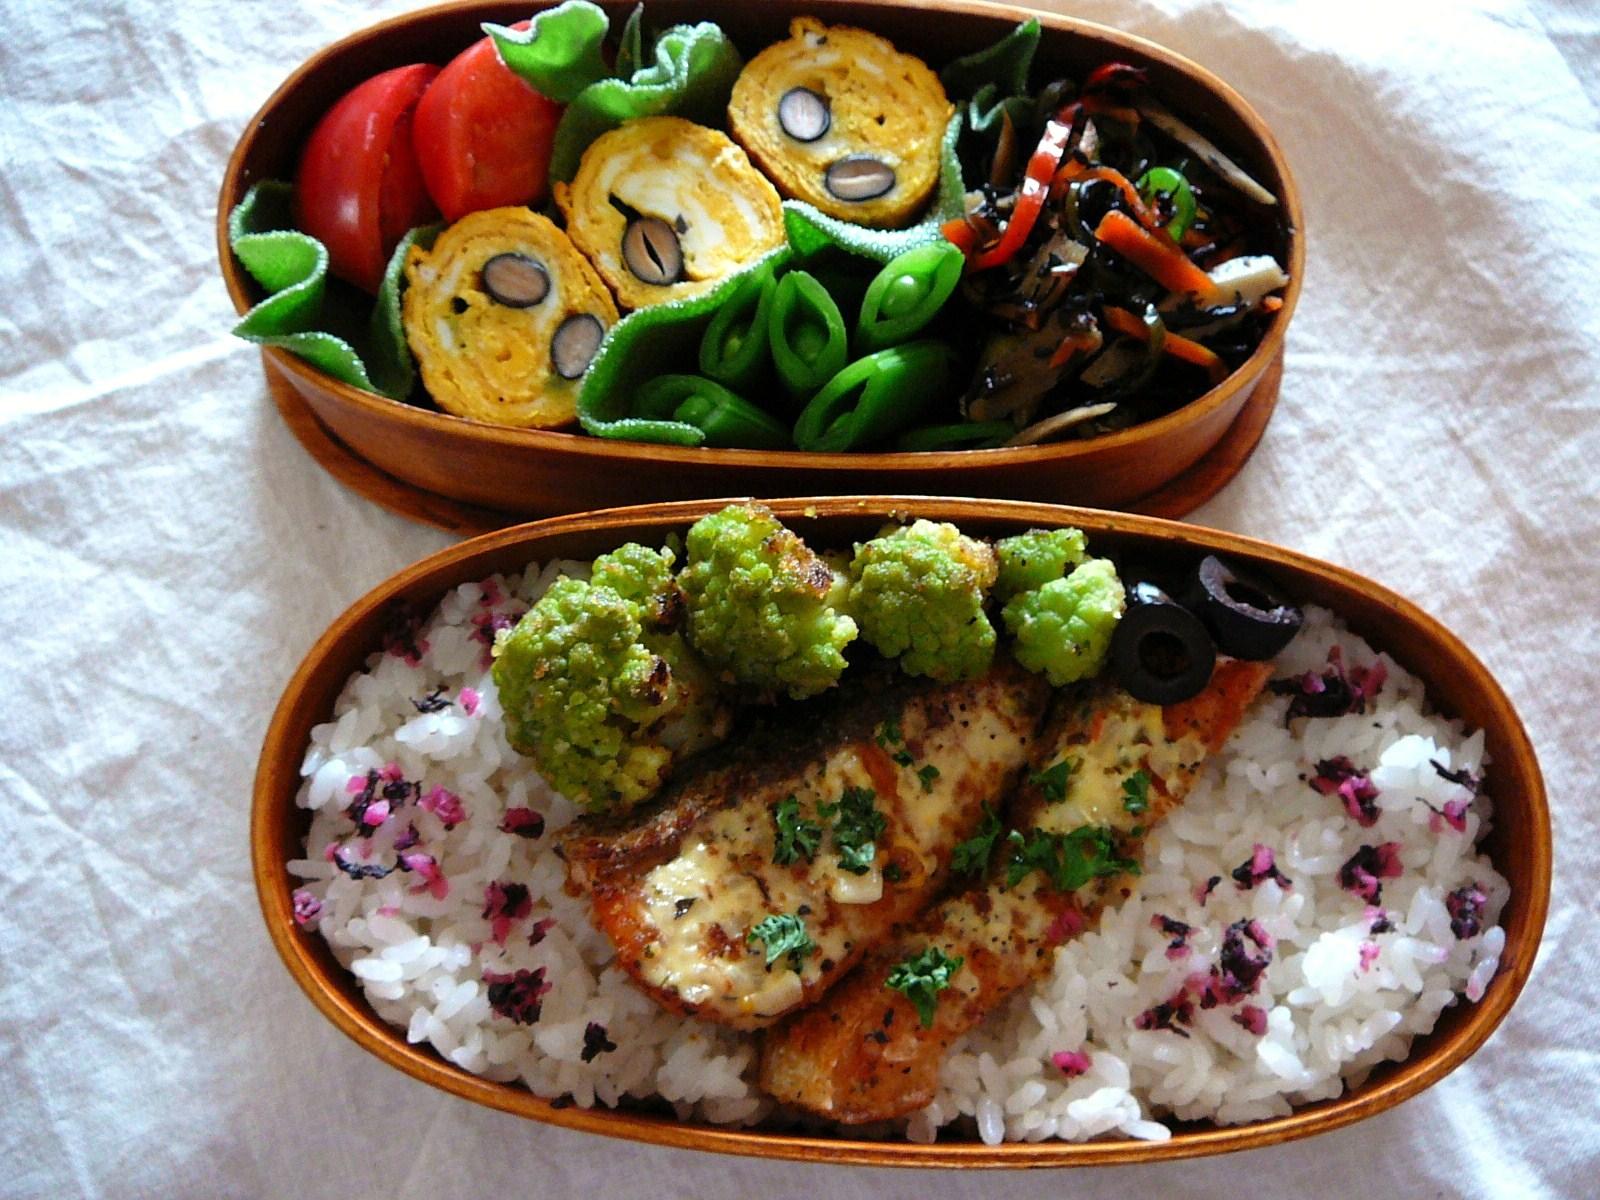 today s bento lunch box 12 12 salmon and smileys bento shizuoka gourmet. Black Bedroom Furniture Sets. Home Design Ideas